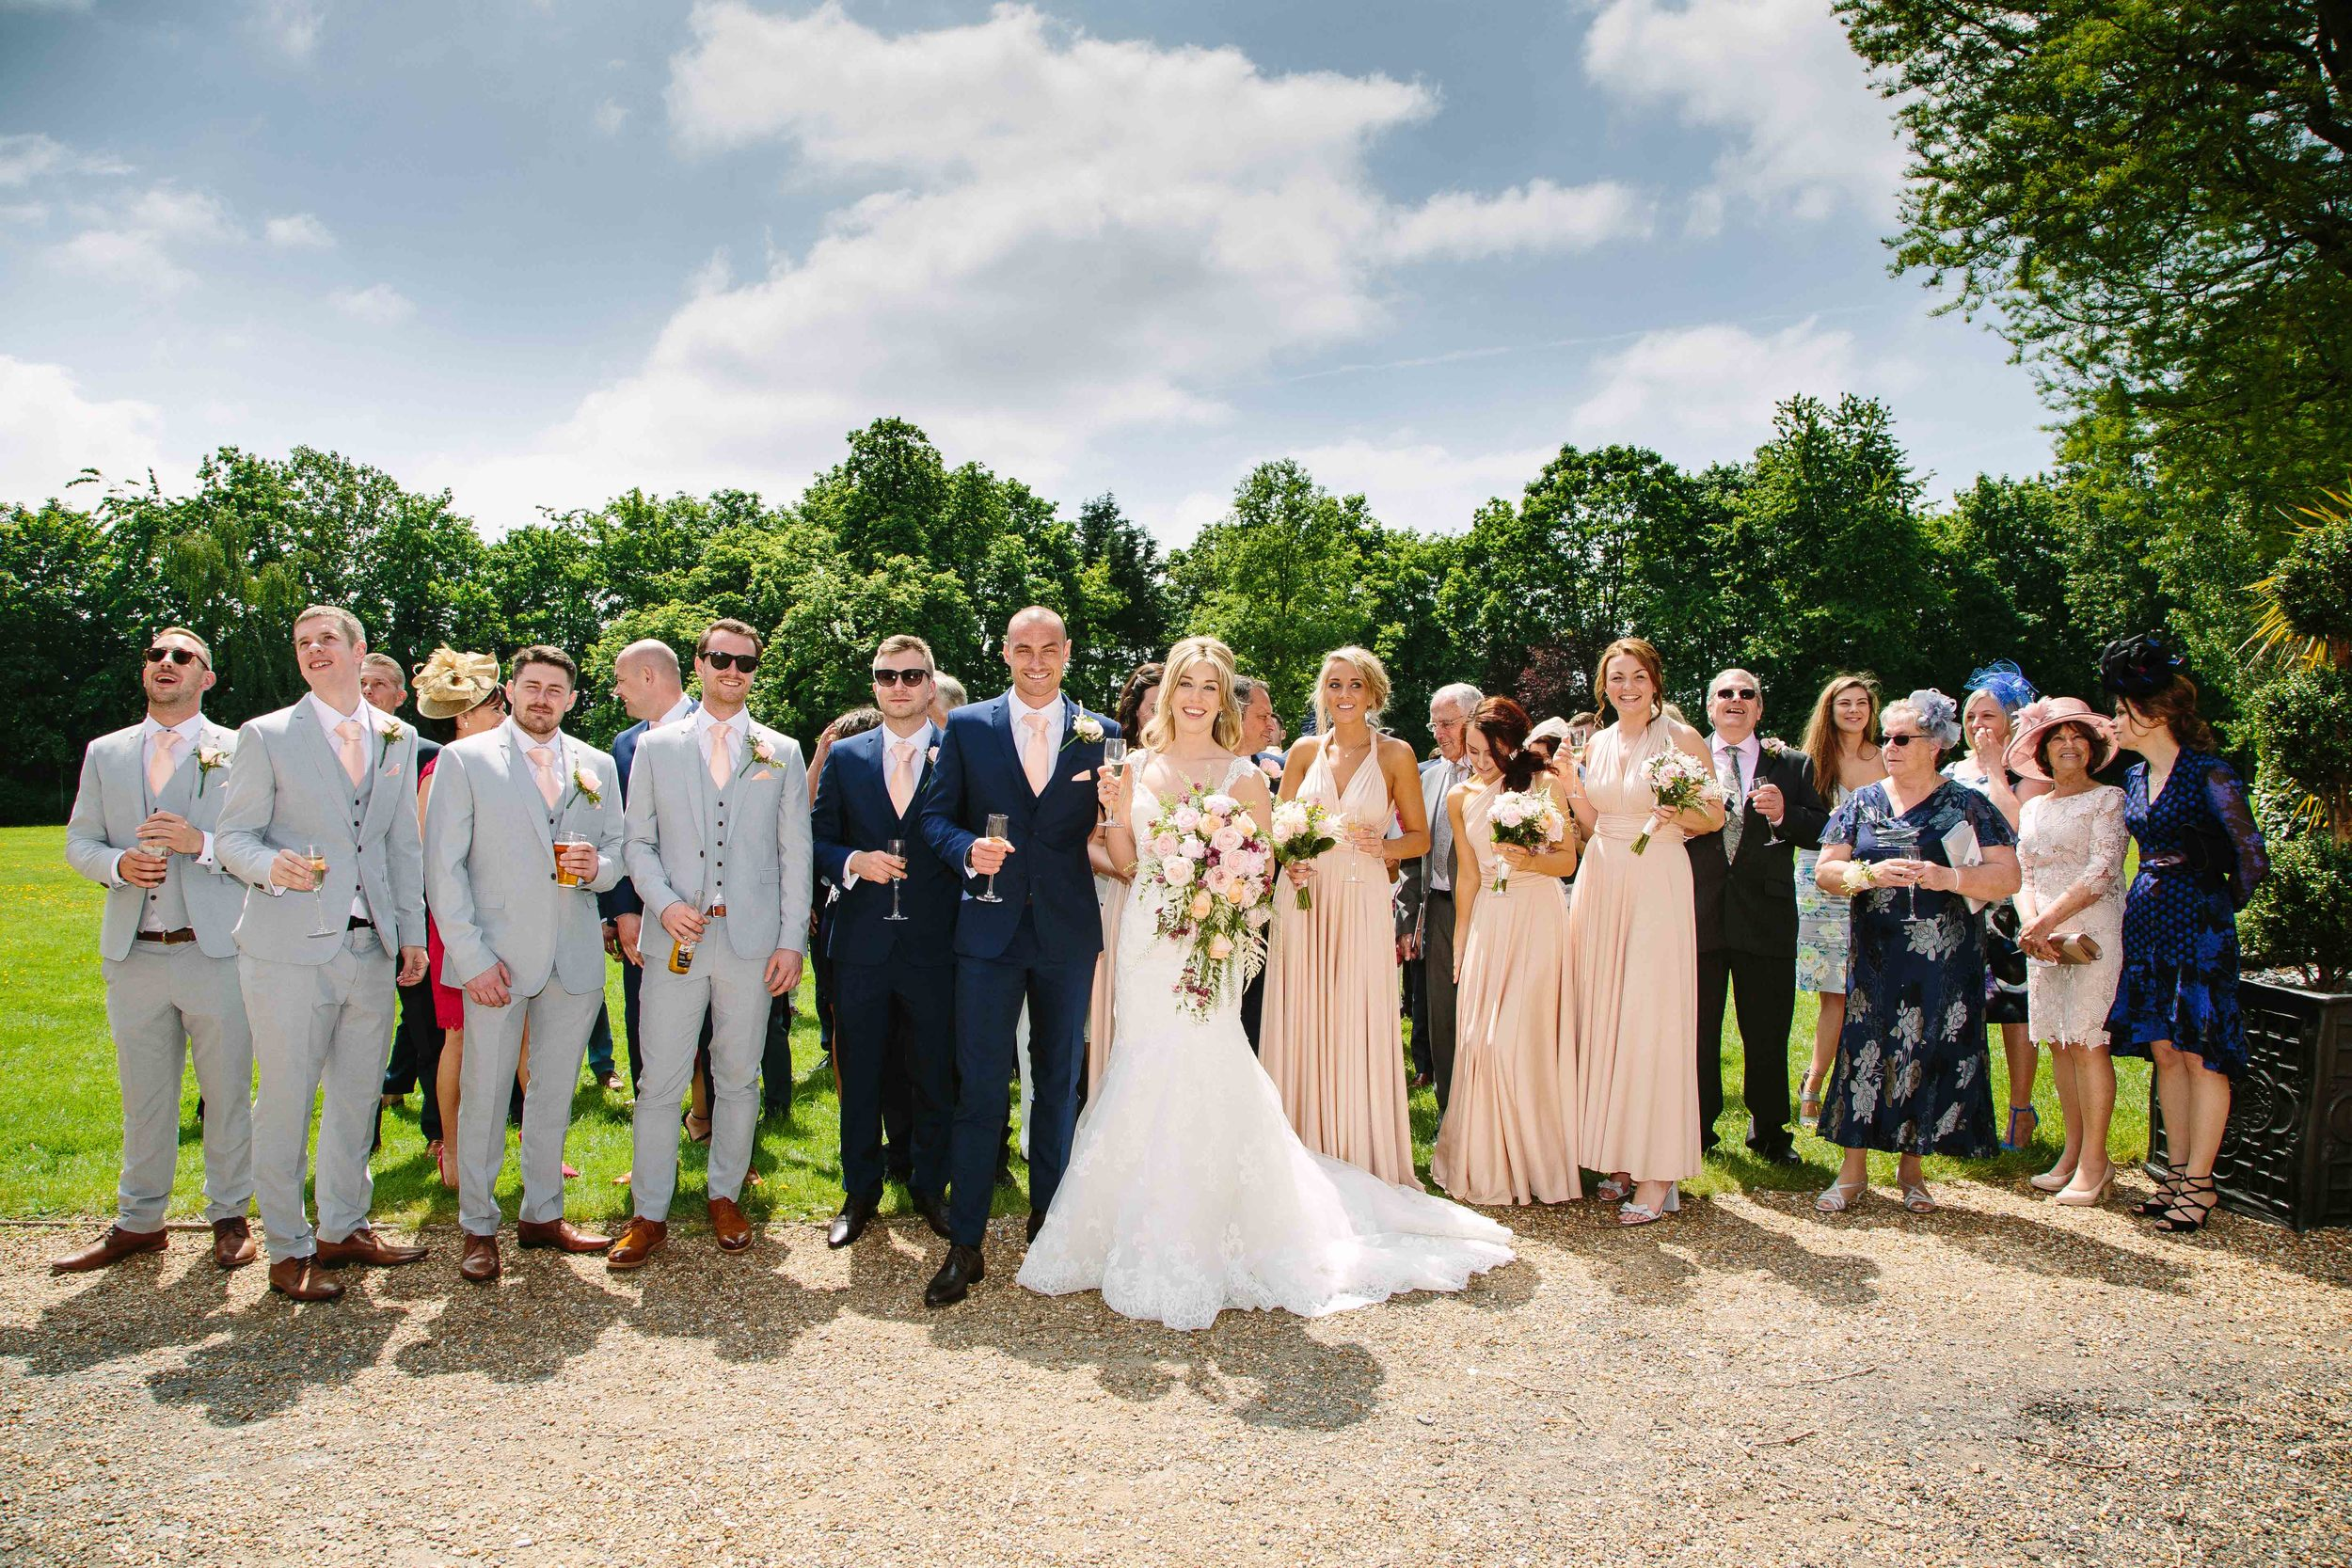 Woodlands-Park-Hotel-Cobham-Surrey-wedding-21